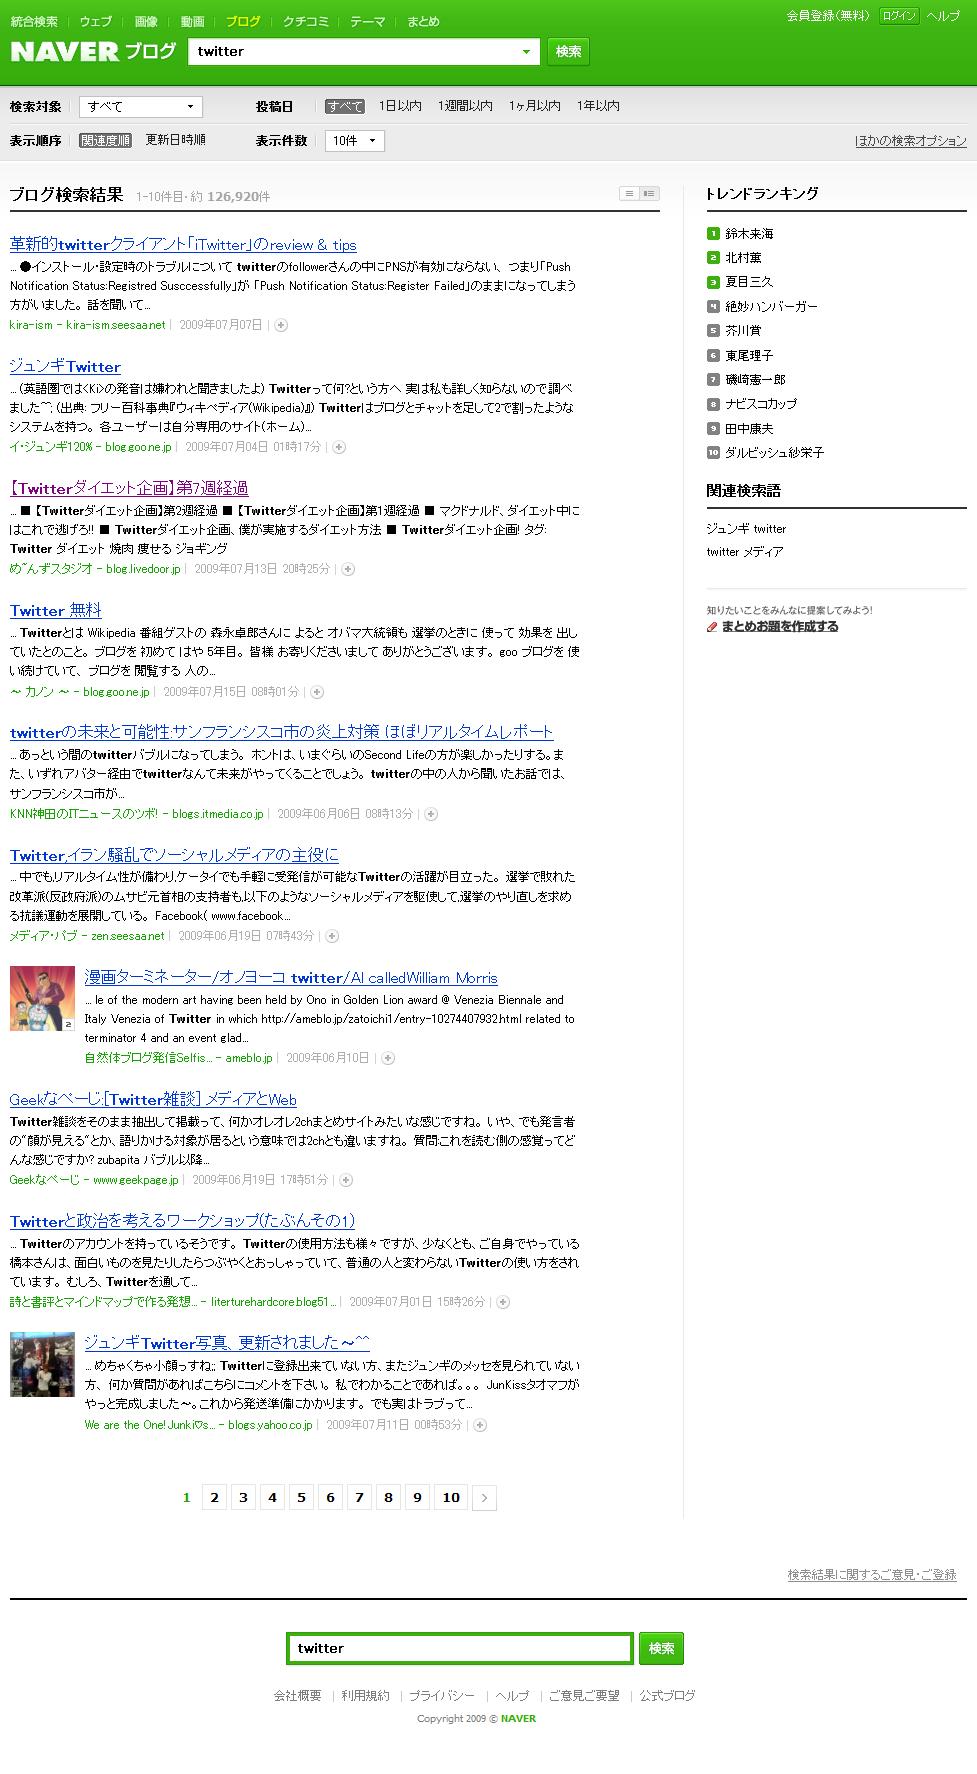 NAVERブログ検索